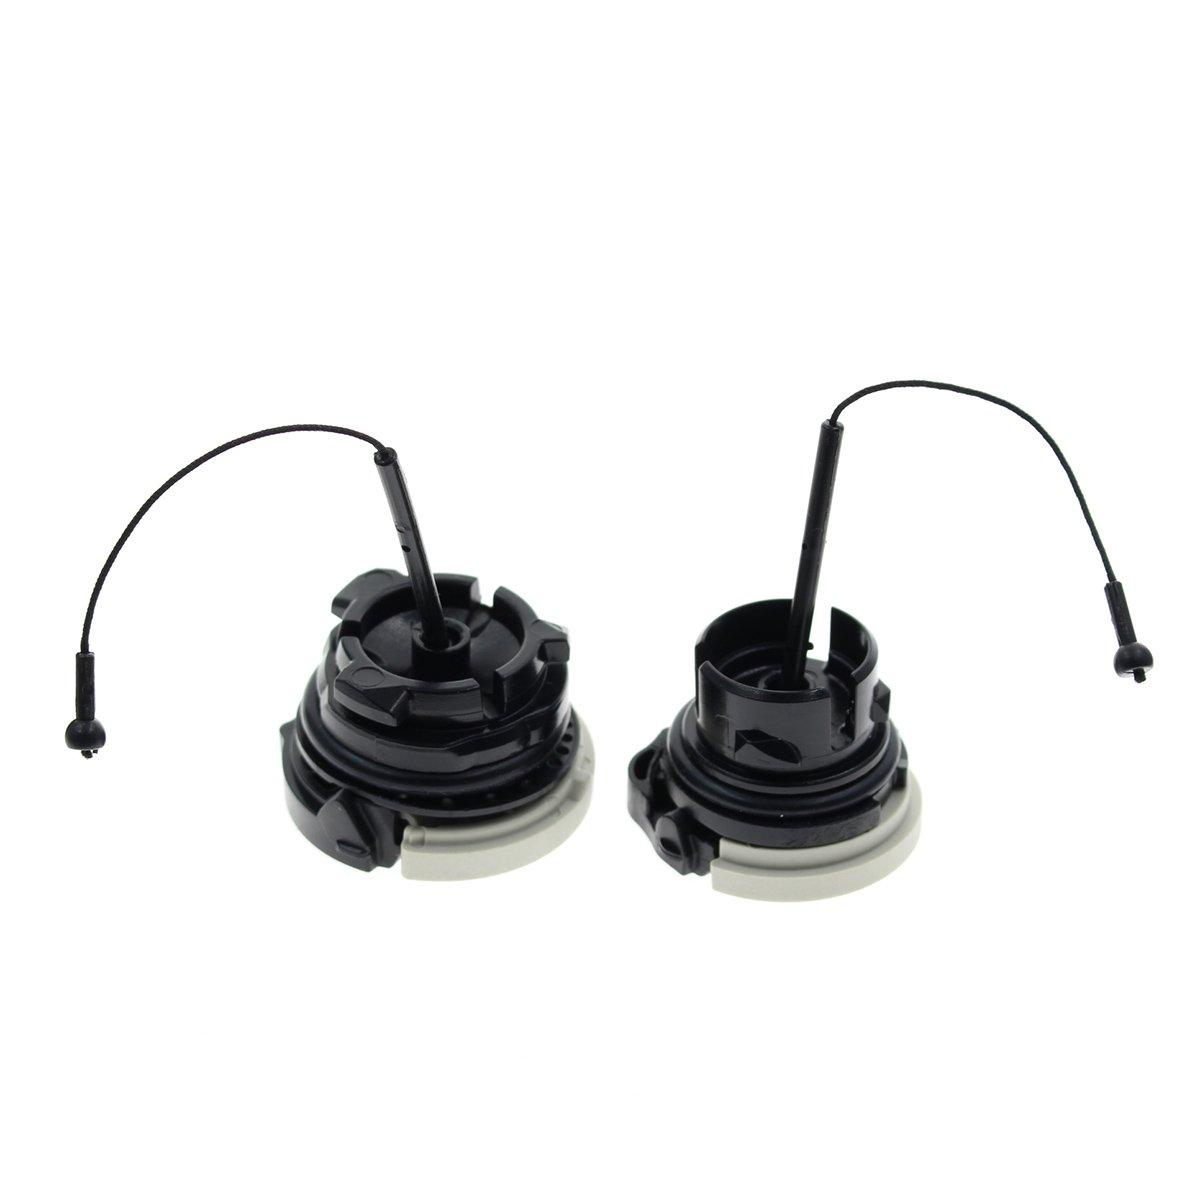 Carbhub Fuel Cap//Oil Cap for STIHL MS210 MS230 MS240 MS250 MS250C MS260 MS340 MS360 Chainsaw